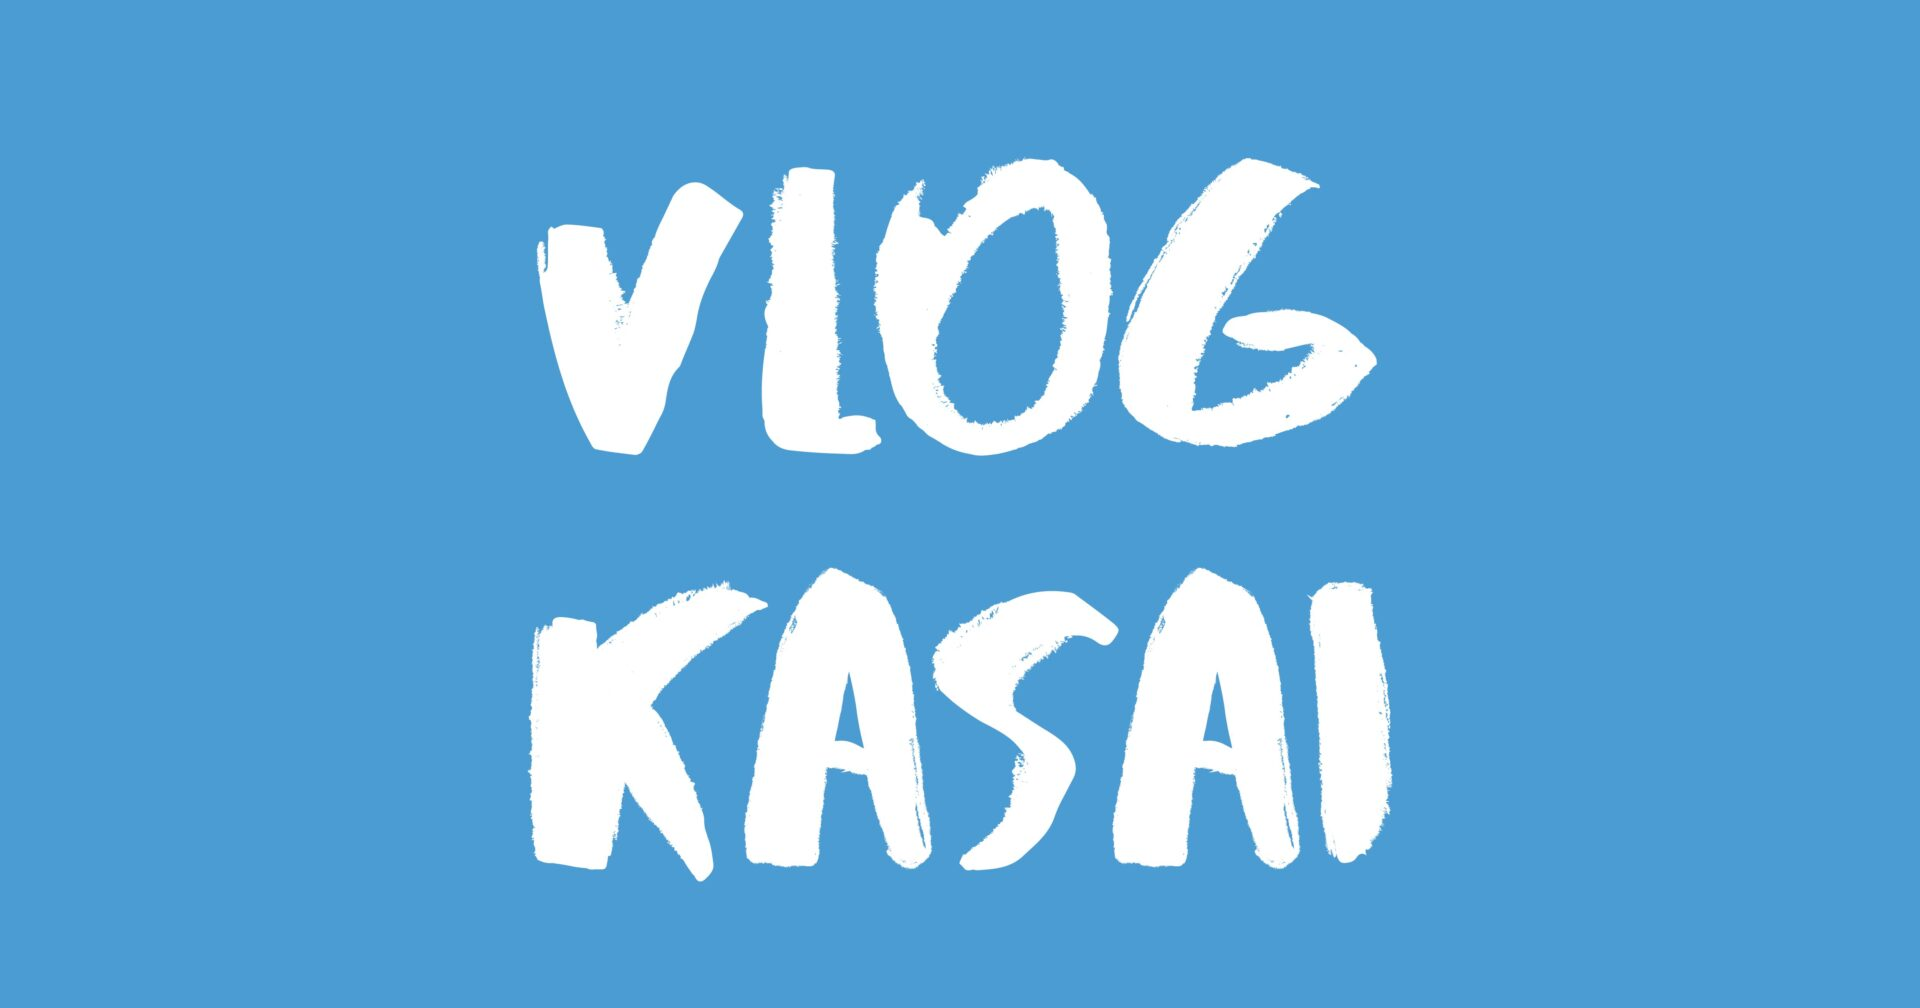 [Vlog] 葛西 / Kasai